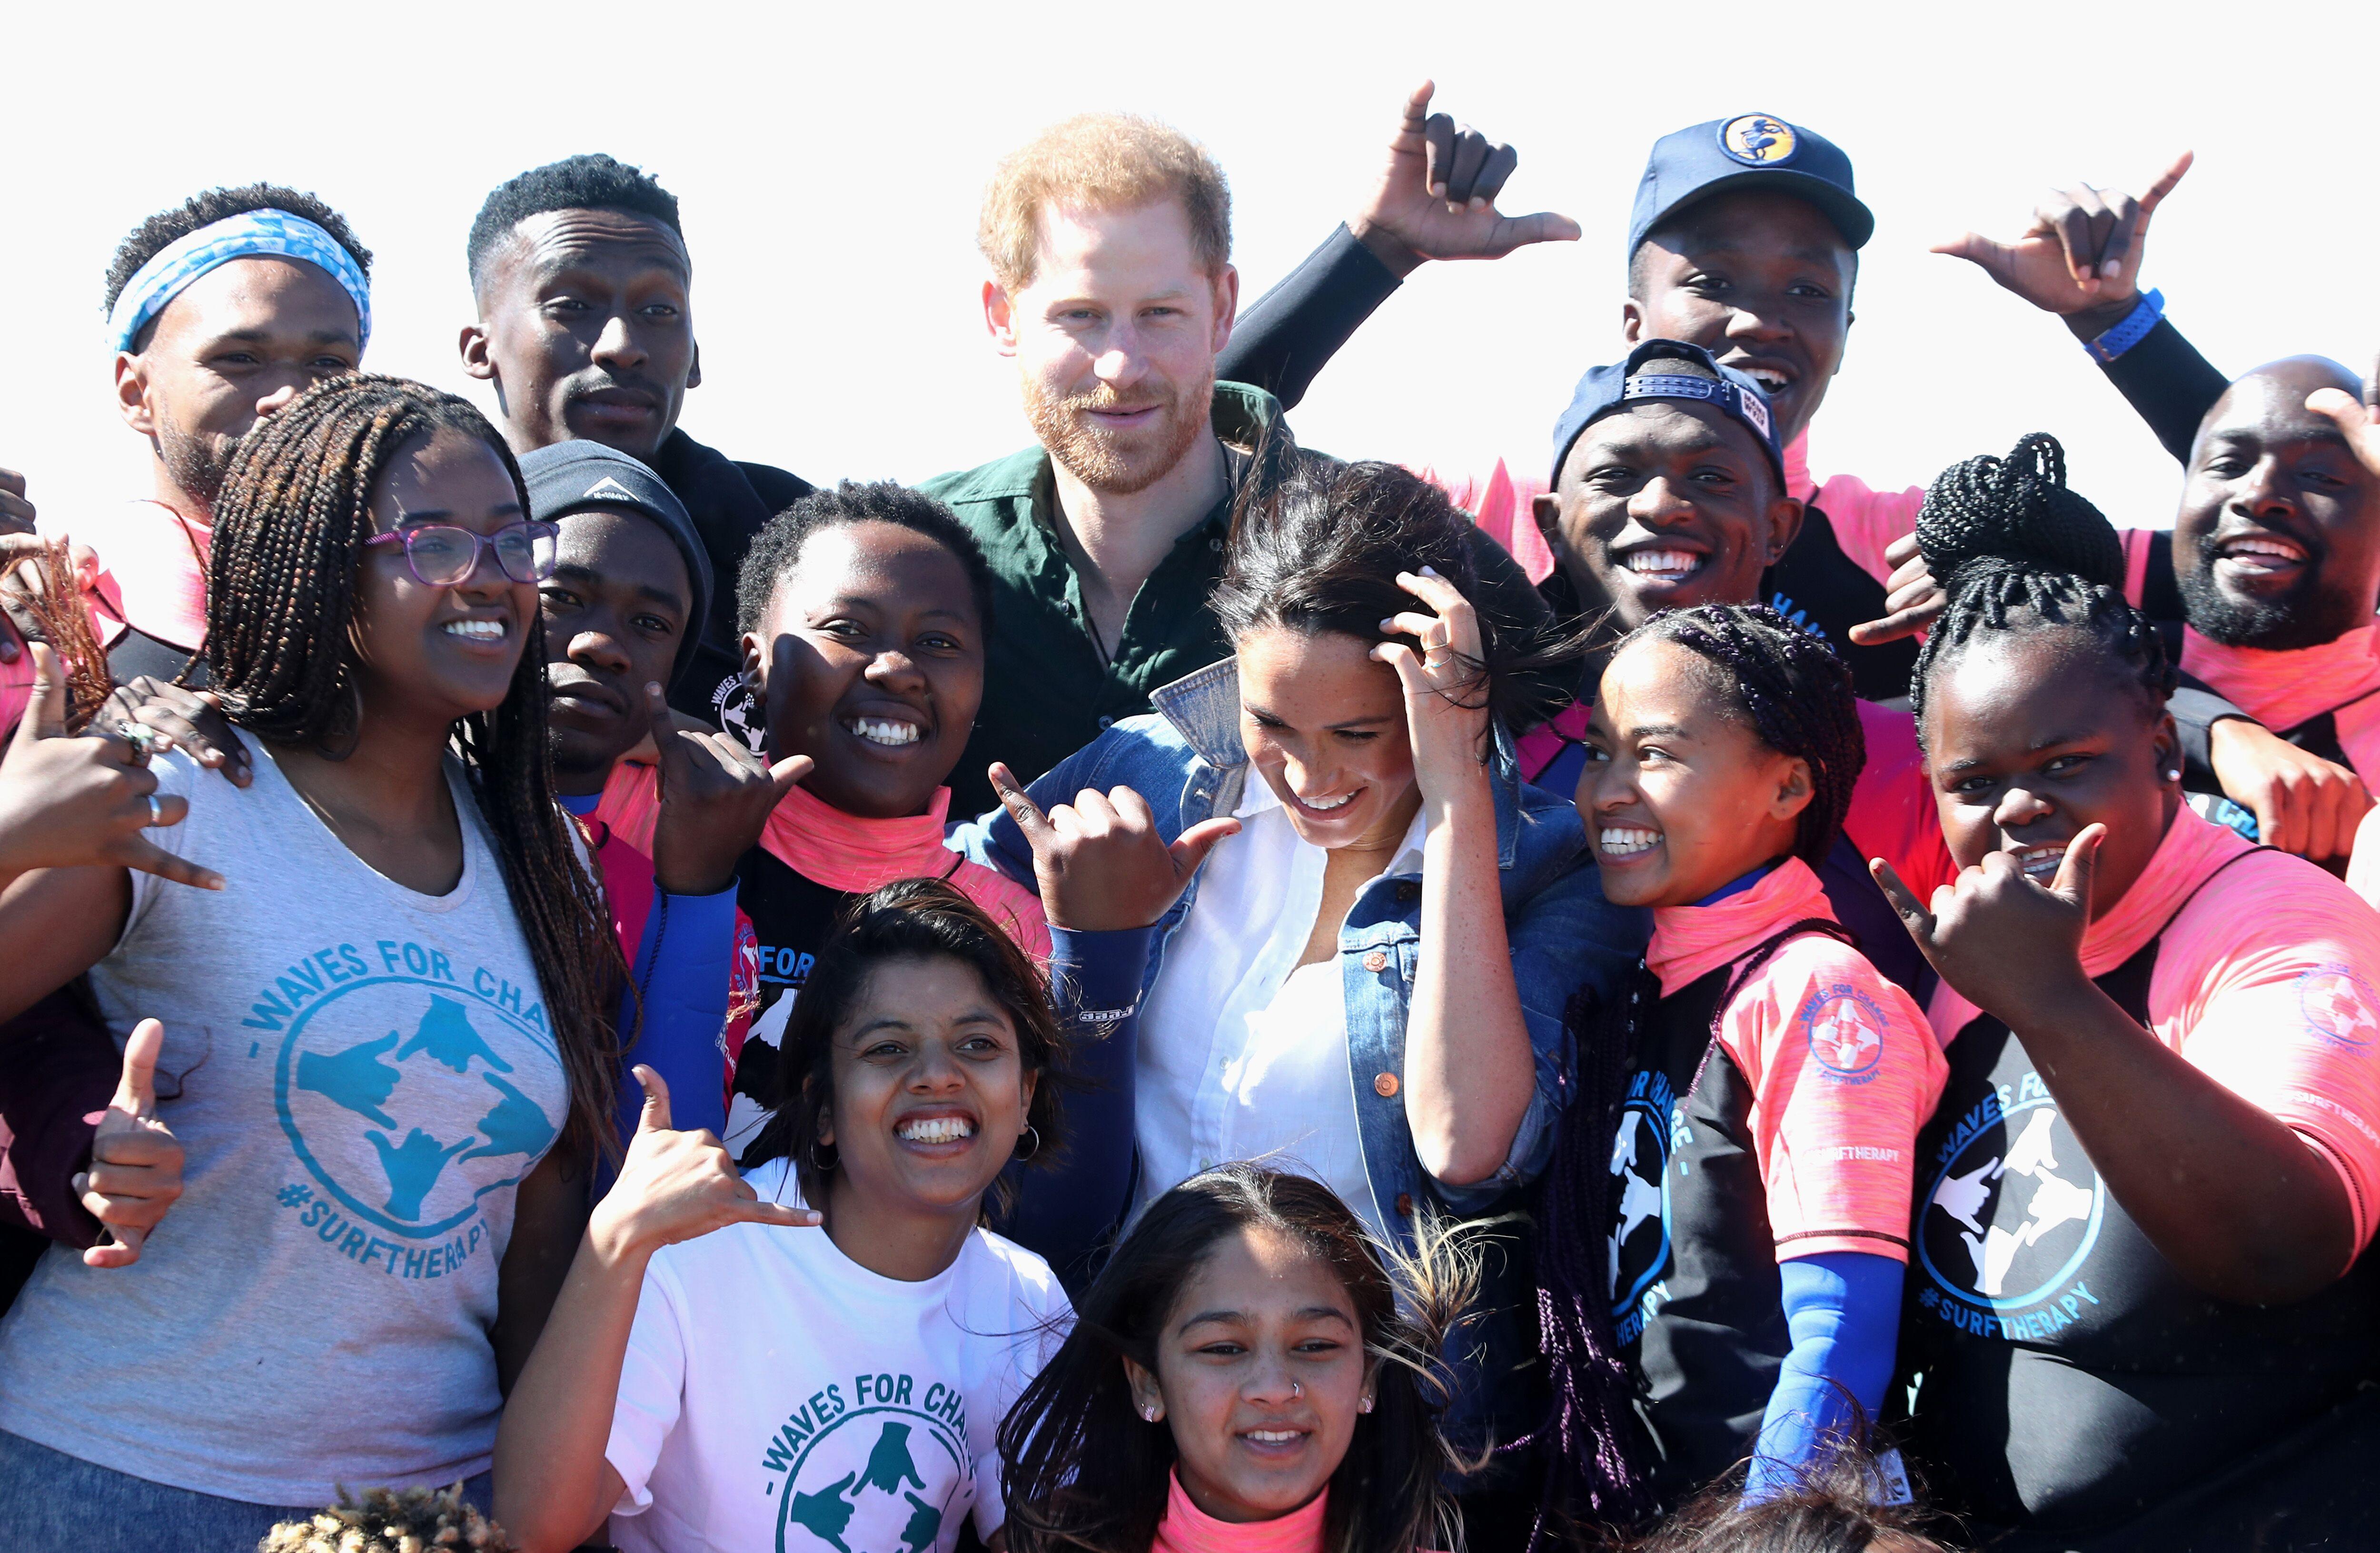 Le prince Harry et Meghan Markle visitent Waves for Change.   Source : Getty Images